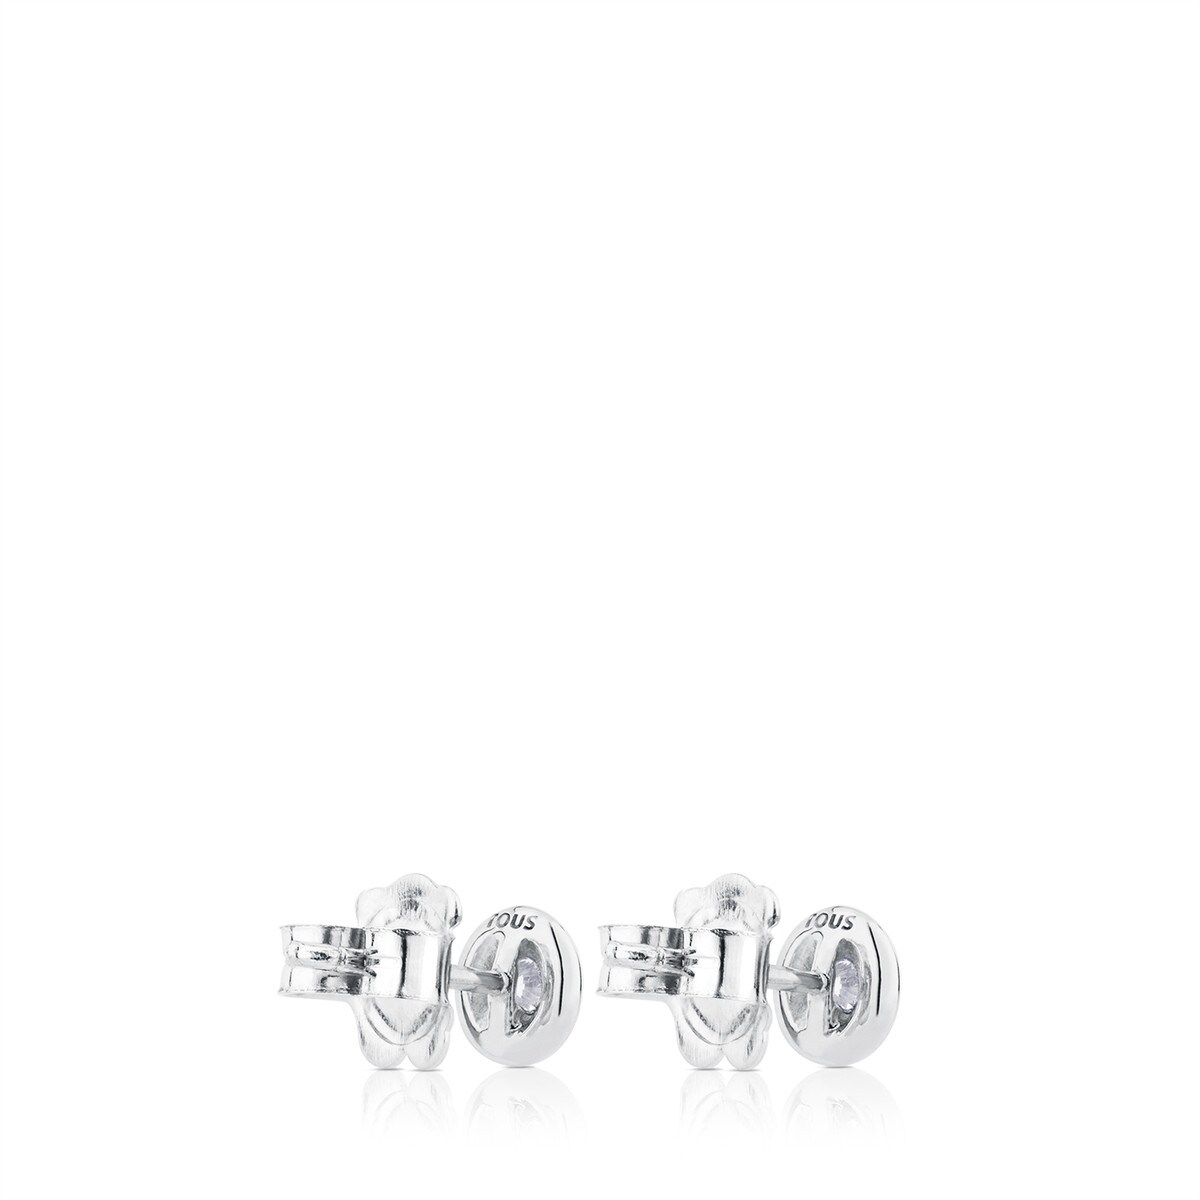 83d051c10b07 Pendientes TOUS Diamonds de Oro blanco con Diamantes - Tous Site ...